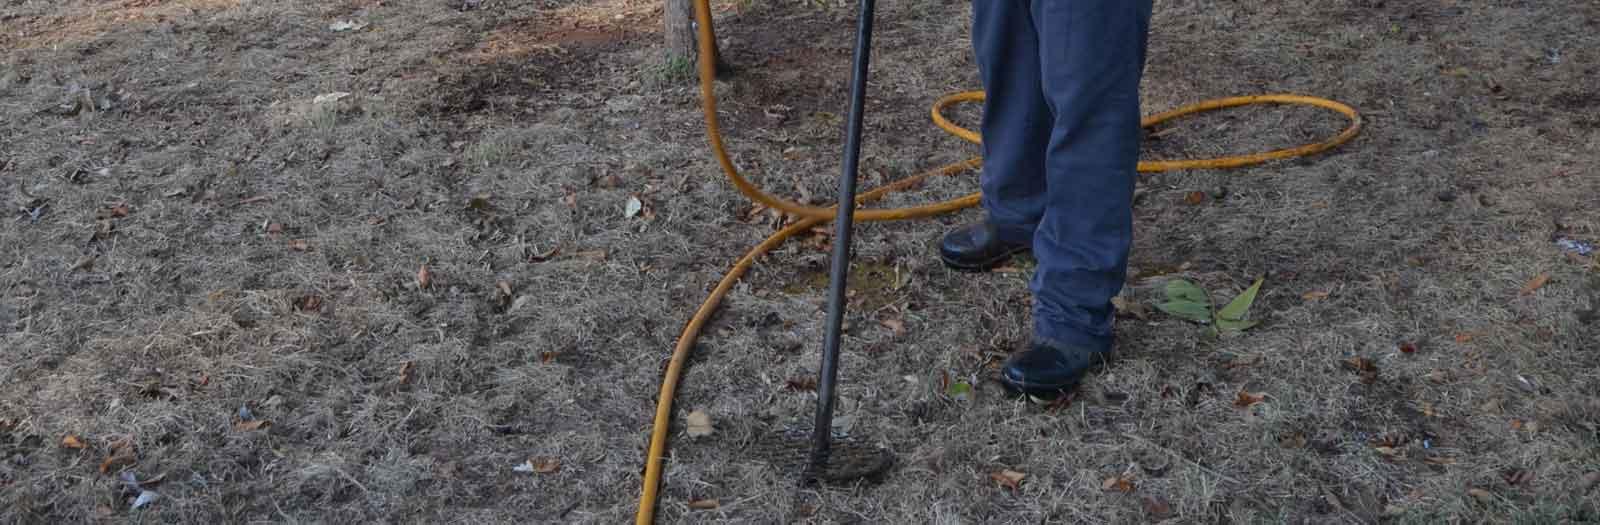 tree professional applying vitamins to tree roots